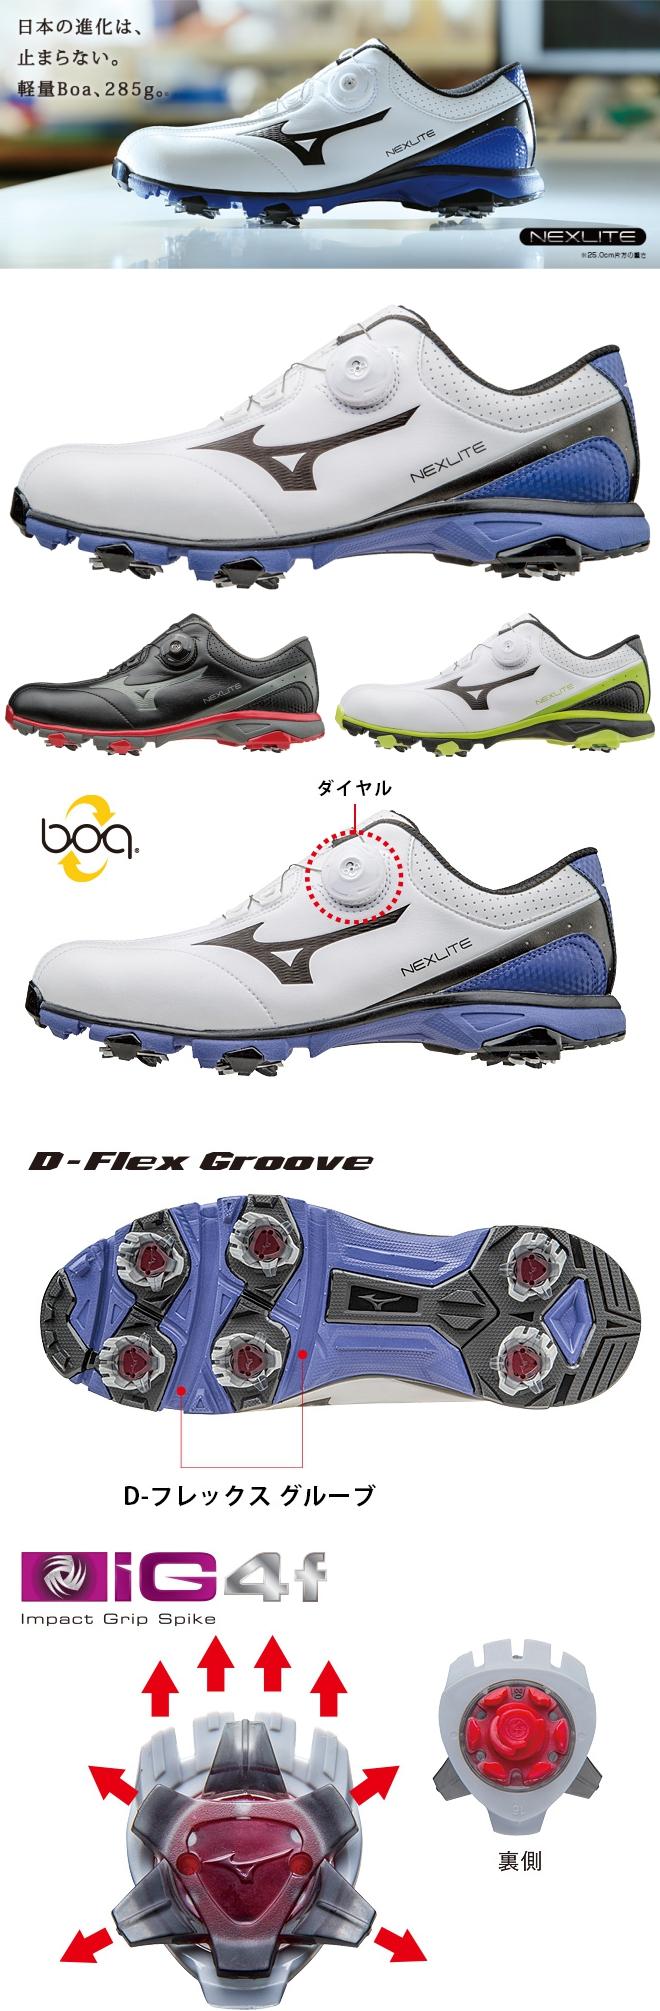 Mizuno Nexlite 003 Boa Shoes